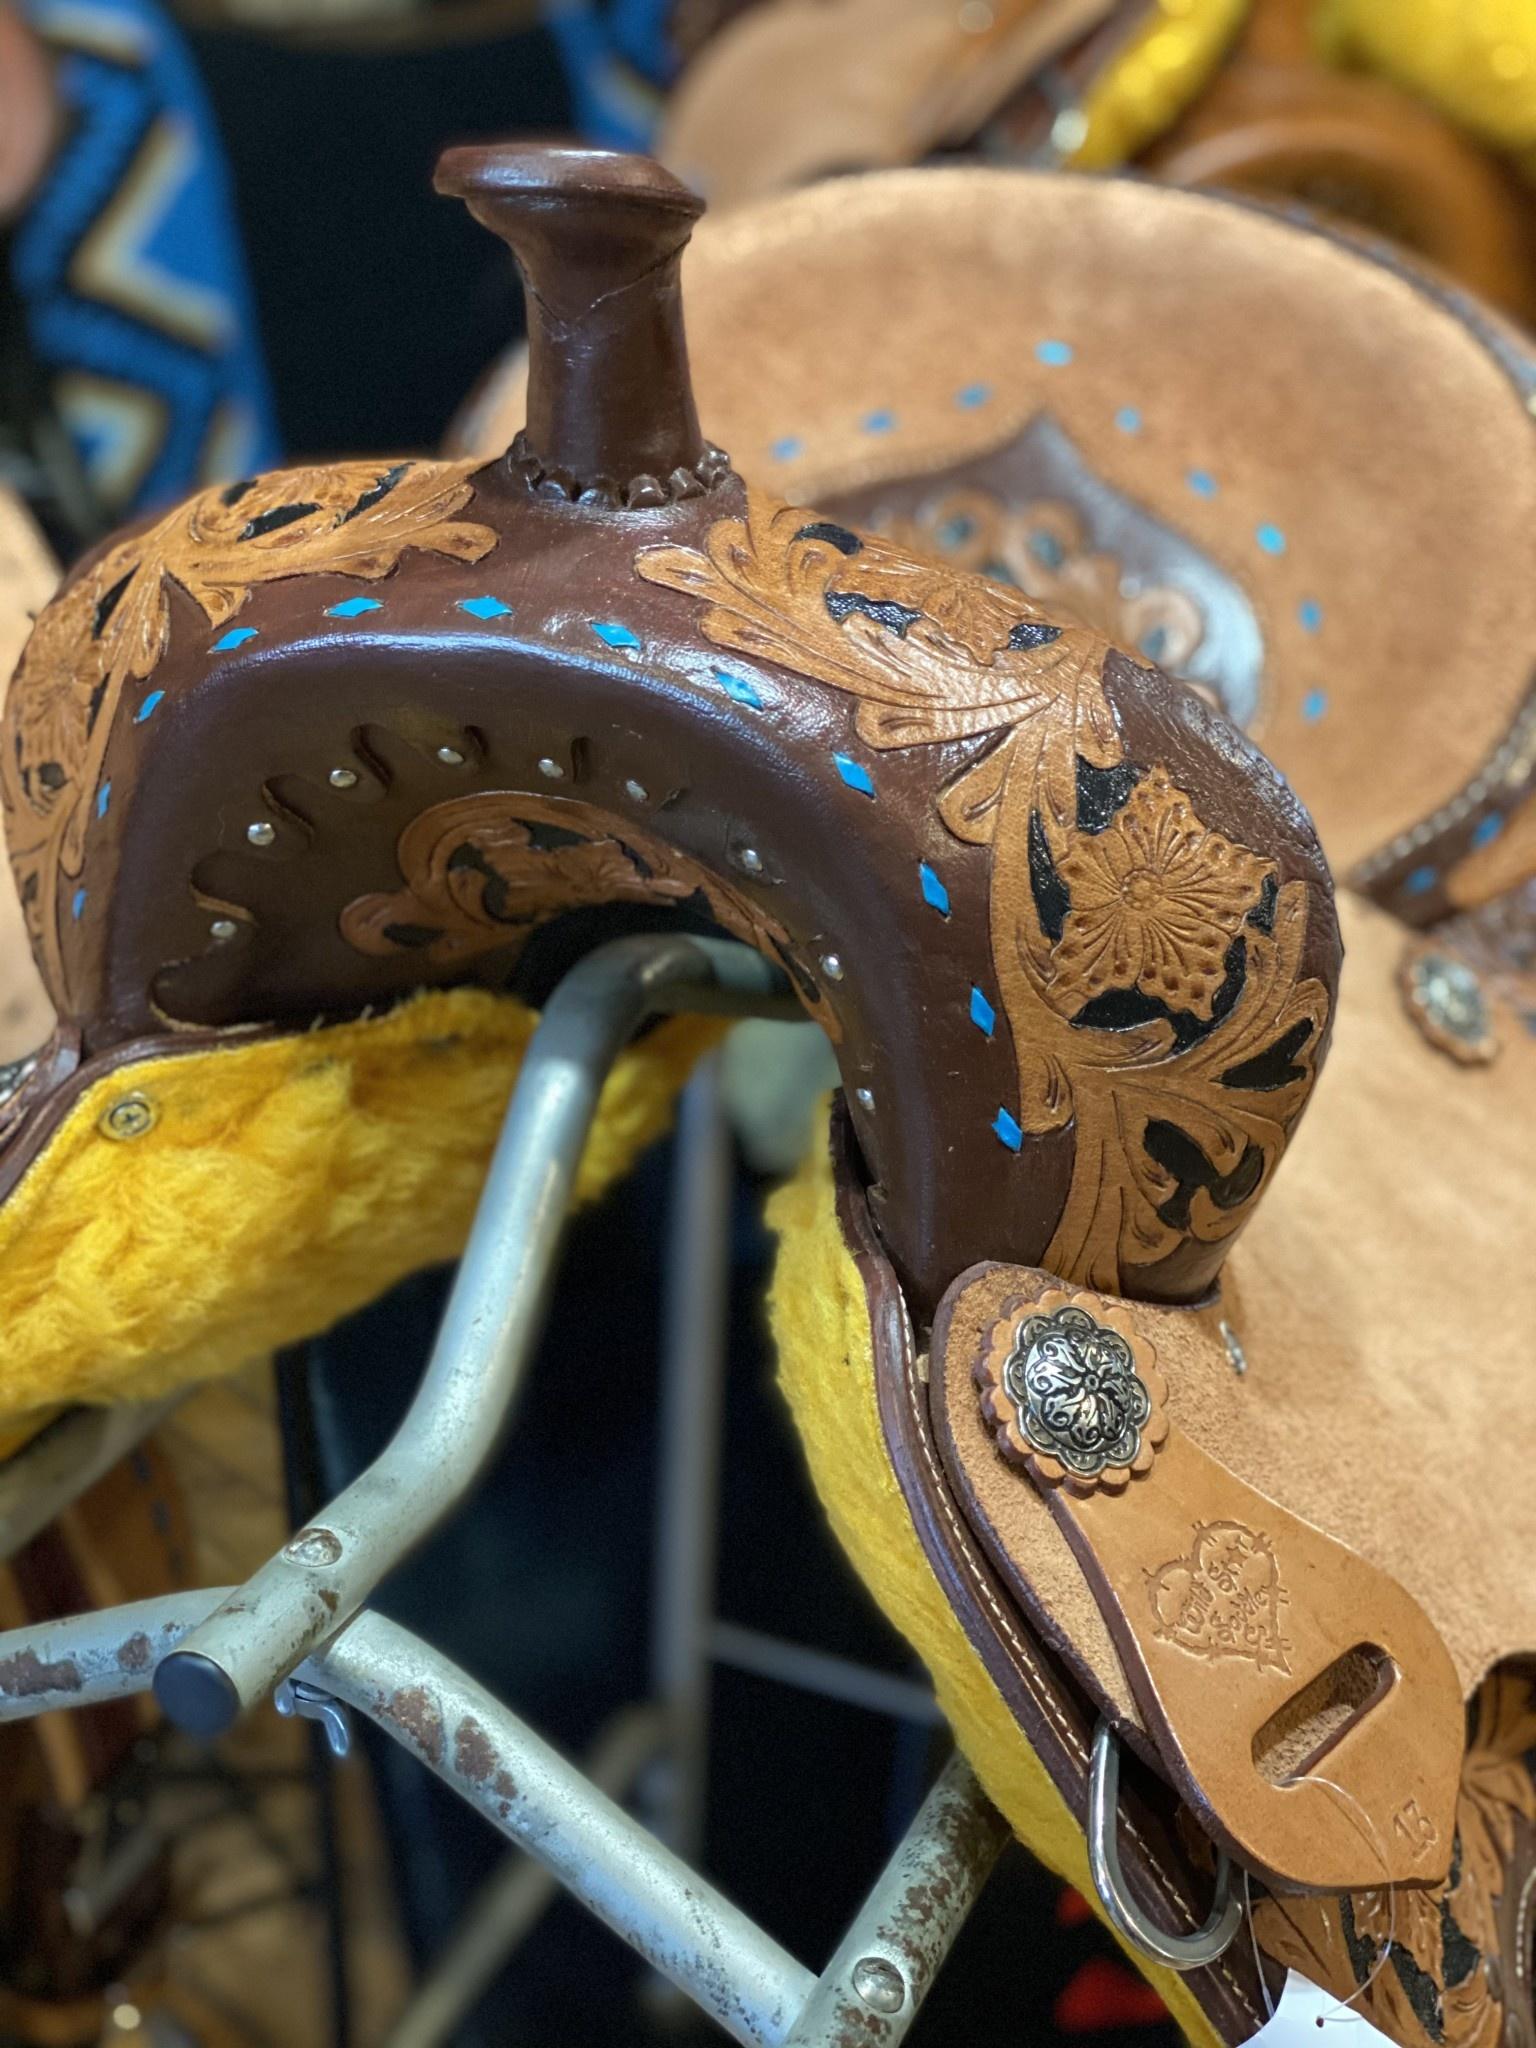 "13"" Wild Star Youth Barrel Saddle - Turquoise Buck Stitch"